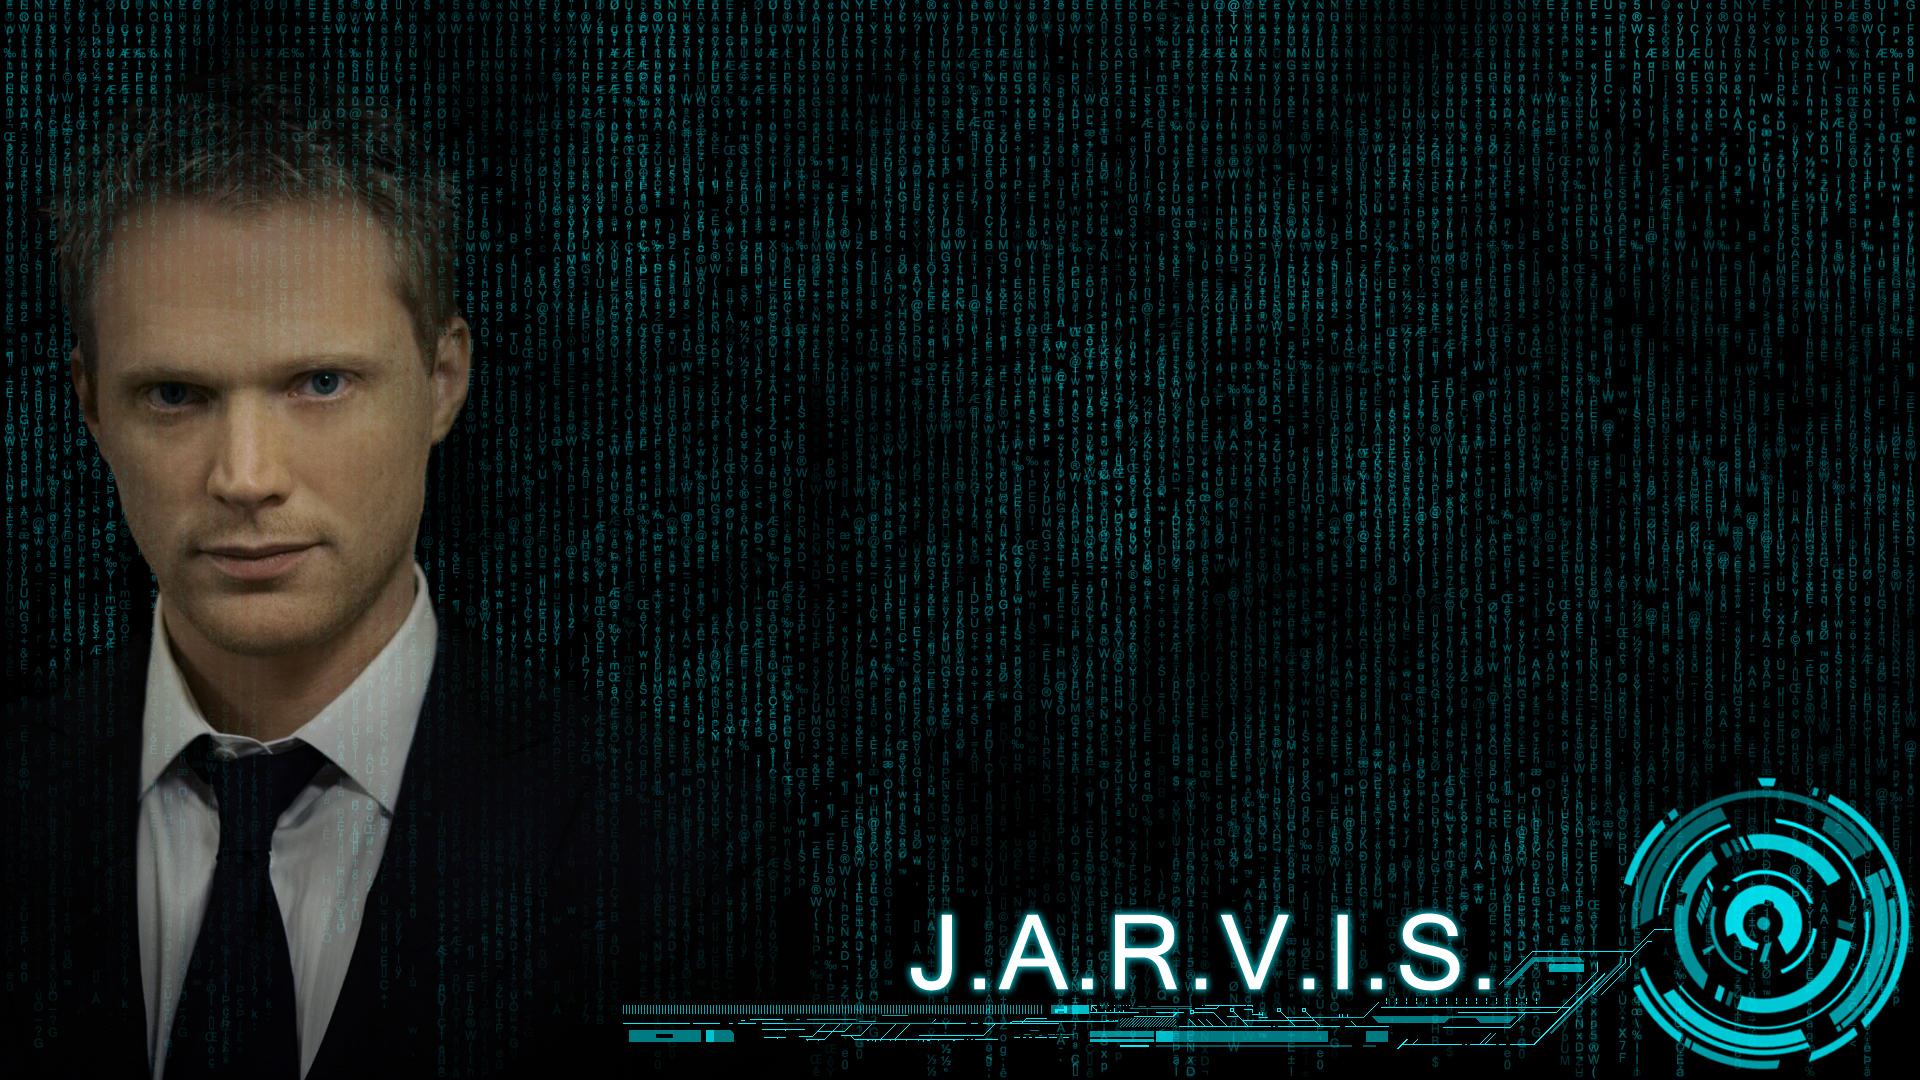 Jarvis Wallpaper 1920x1080